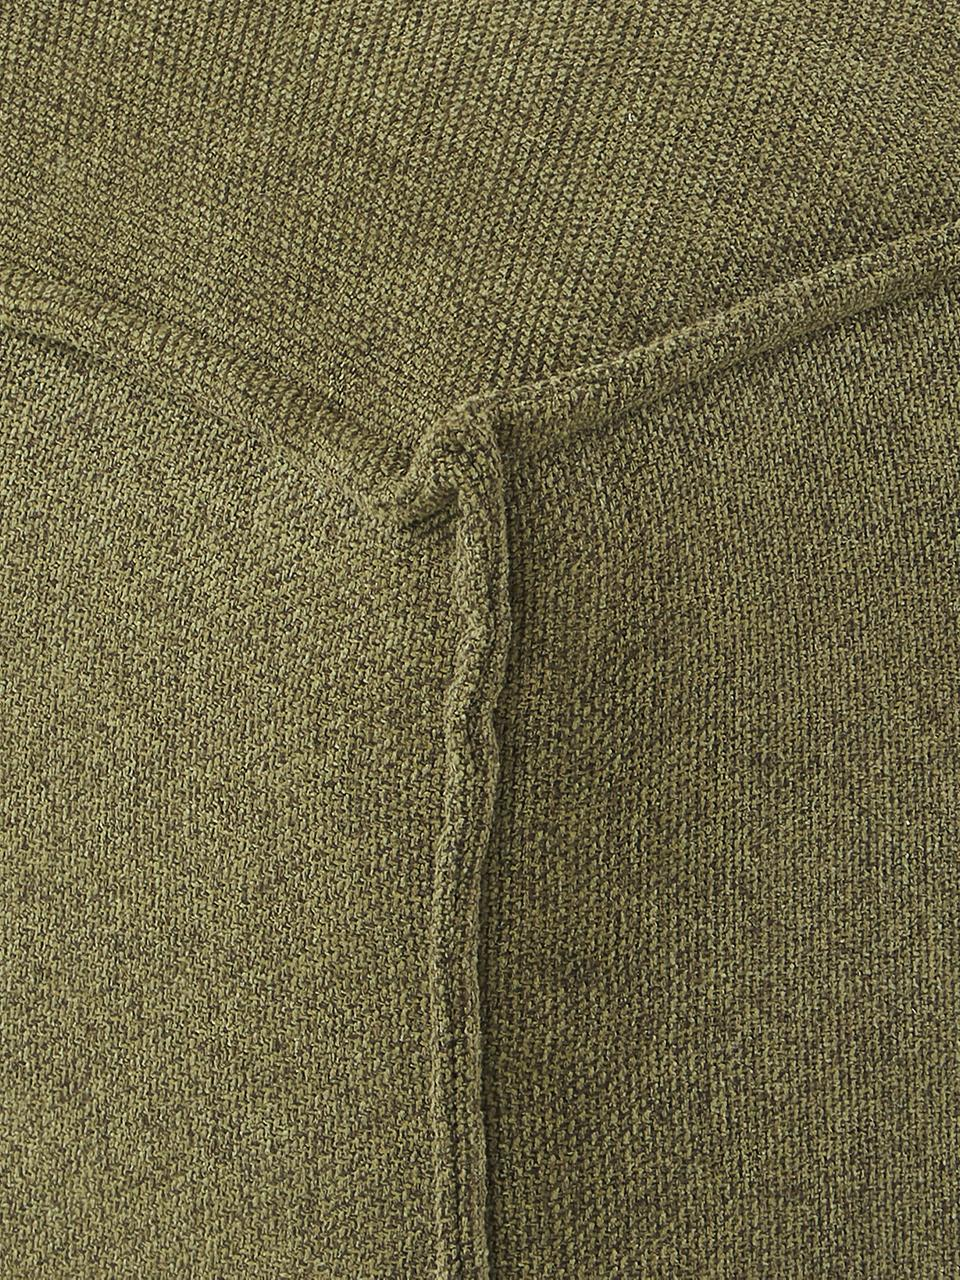 Sofa-Hocker Lennon in Grün, Bezug: 100% Polyester 35.000 Sch, Gestell: Massives Kiefernholz, Spe, Füße: Kunststoff, Webstoff Grün, 88 x 43 cm